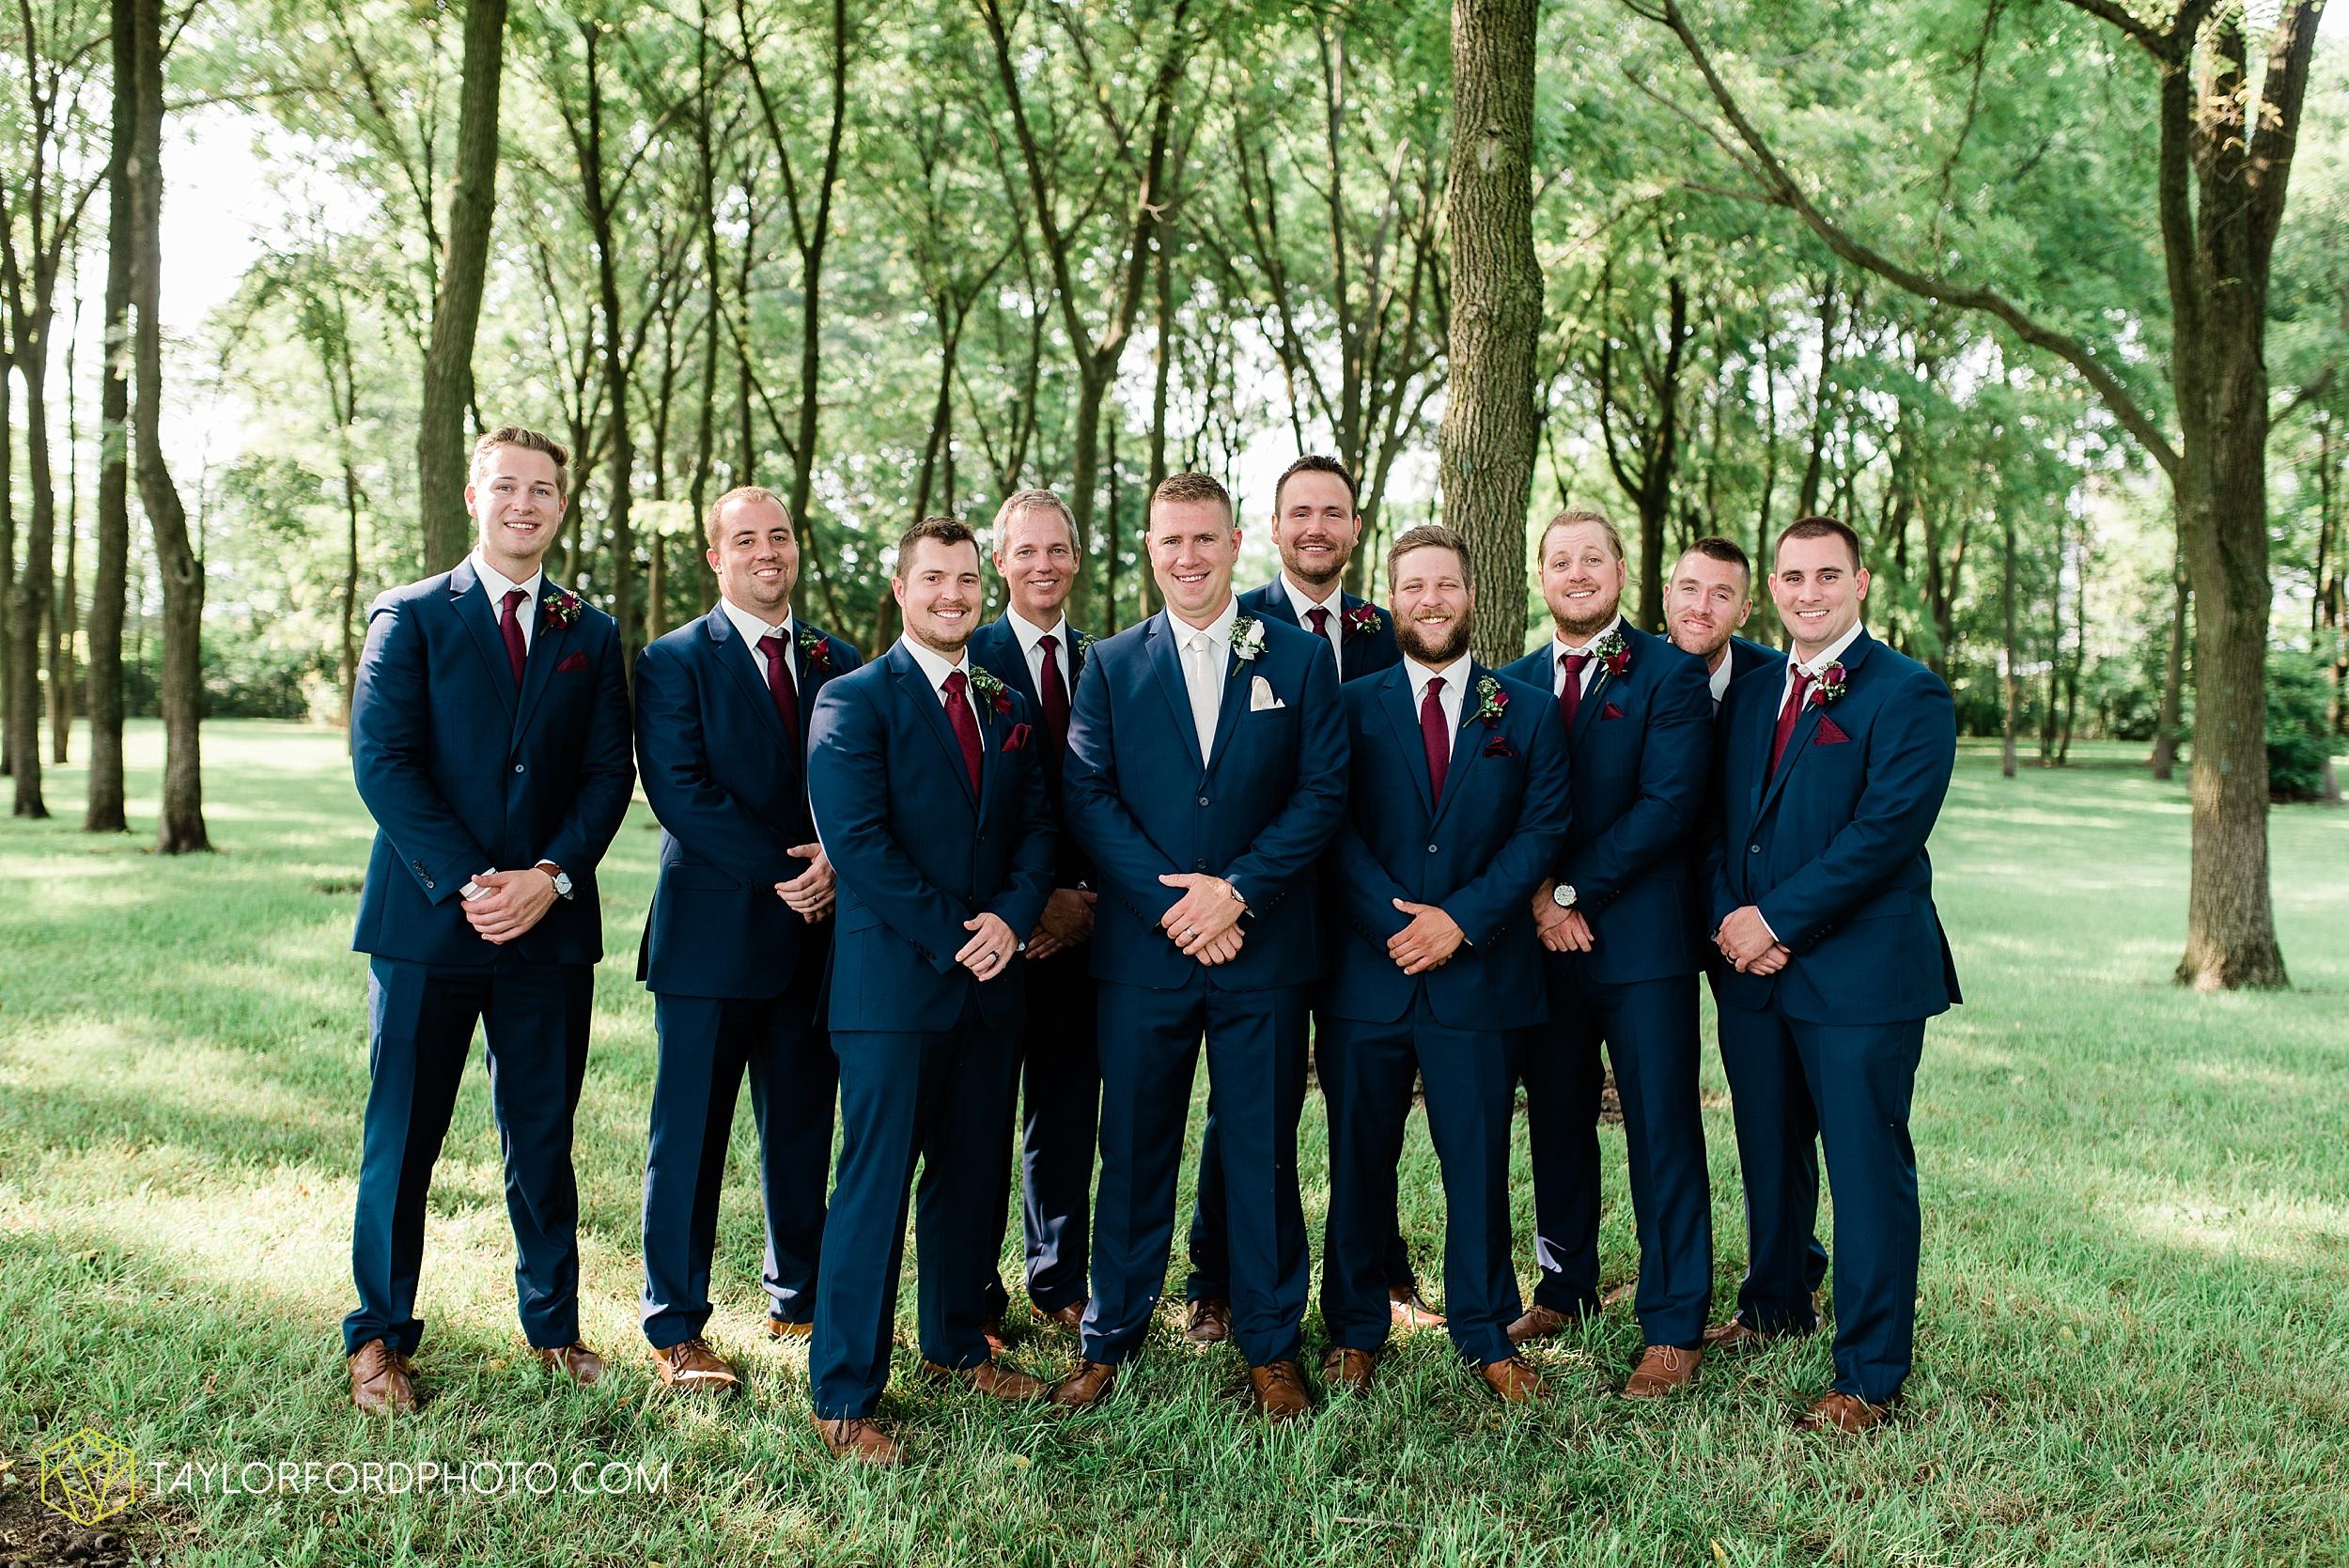 van-wert-ohio-first-united-methodist-church-county-dairy-barn-wedding-photographer-taylor-ford-photography_9847.jpg